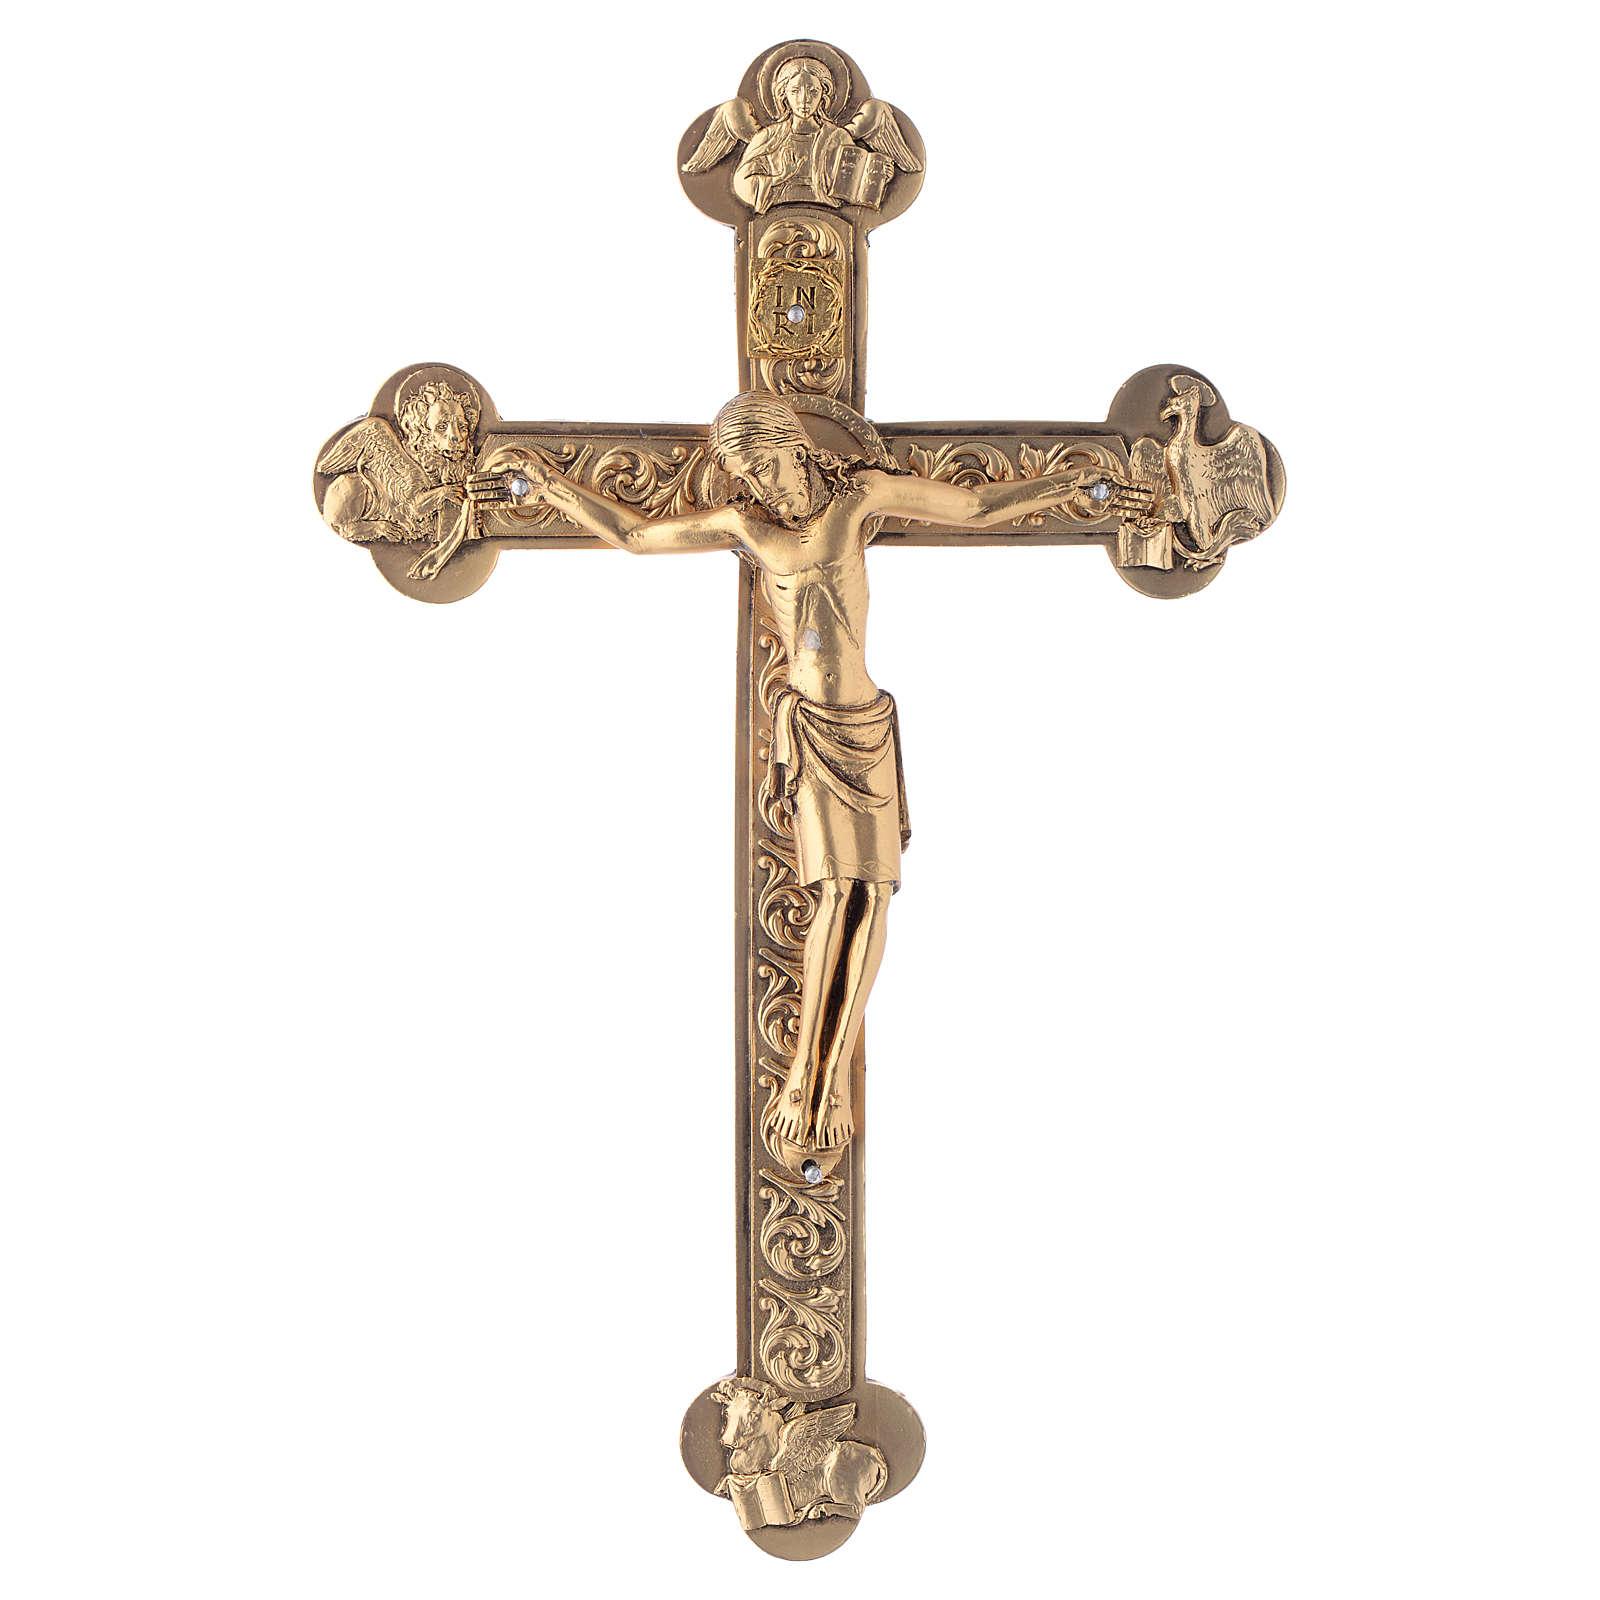 Crocefisso metallo 4 evangelisti dorato o argentato 4